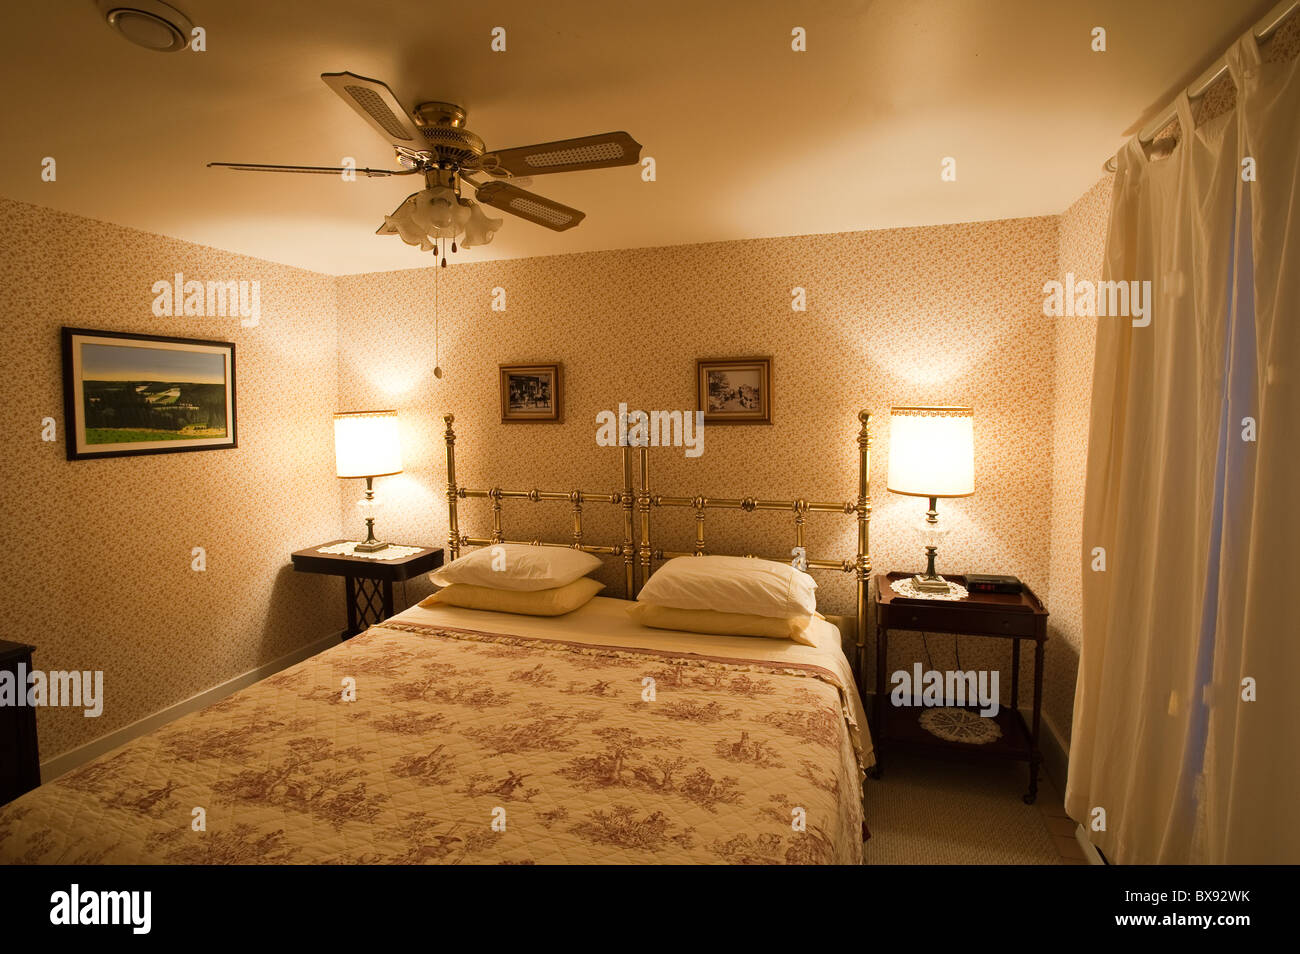 Victoria, Prince Edward Island. Orient Hotel. - Stock Image